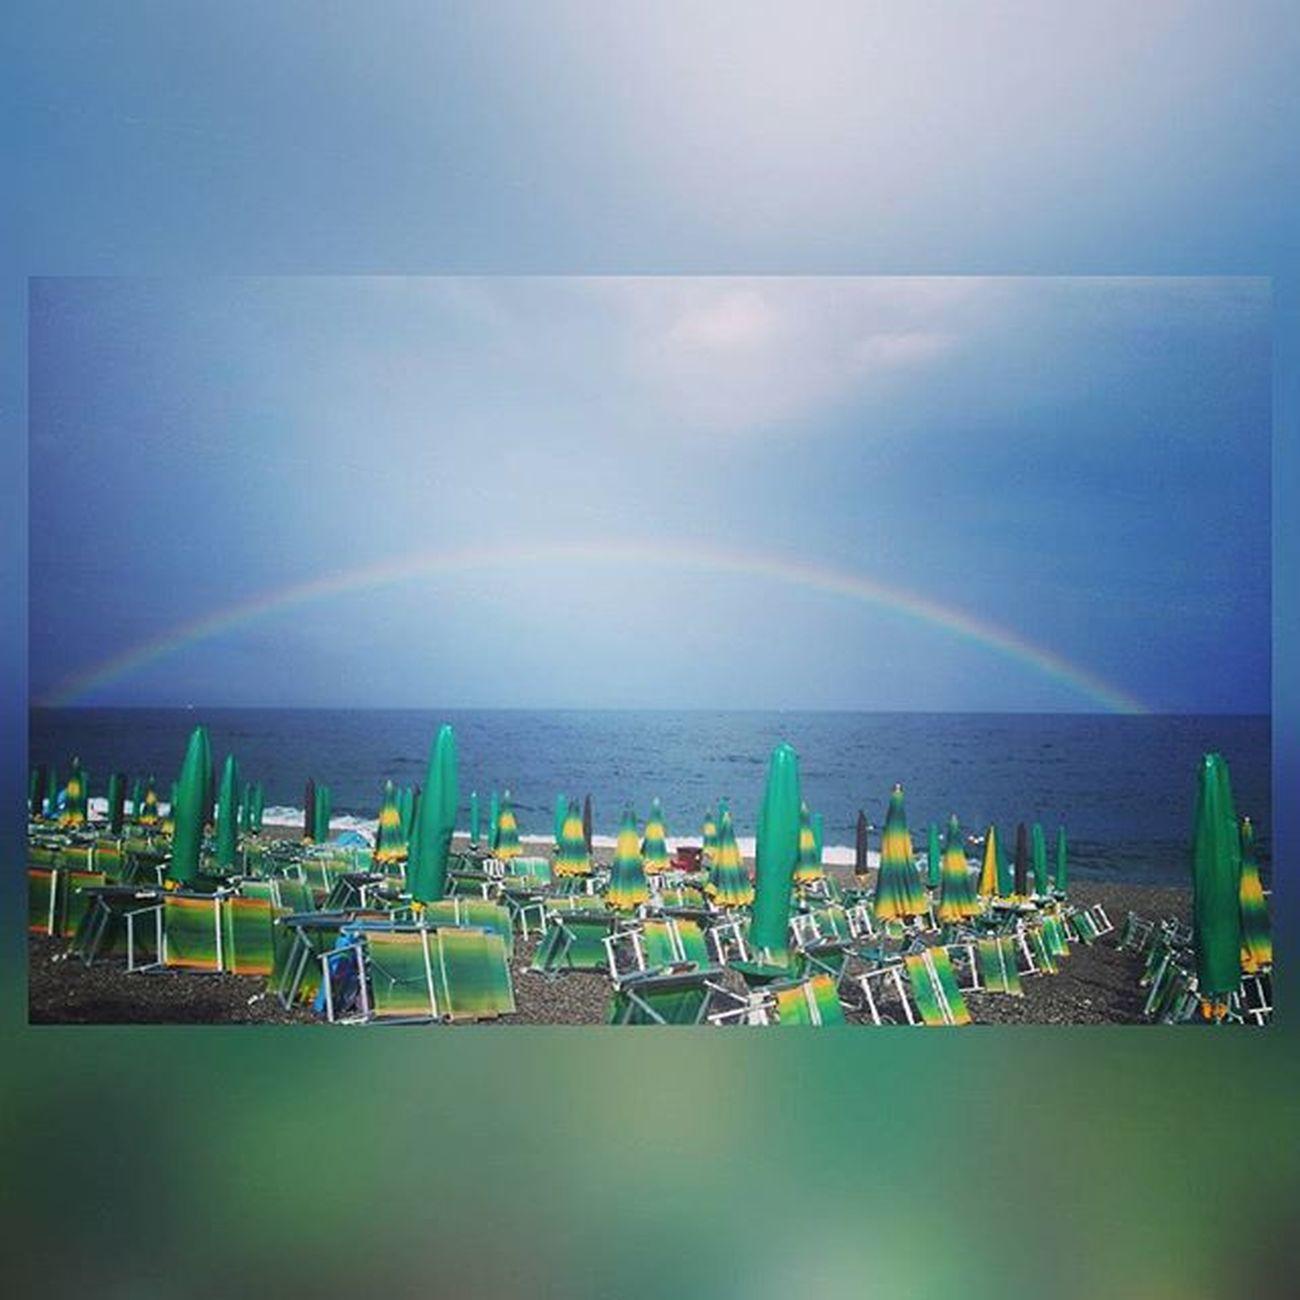 Fondachello Sicilia Sicily Mare Sea Arcobaleno  Rainbow Rainbows Cool Style Instagramers Instagood Follow4follow Like4like Ciaone EDC Edm Summer2015